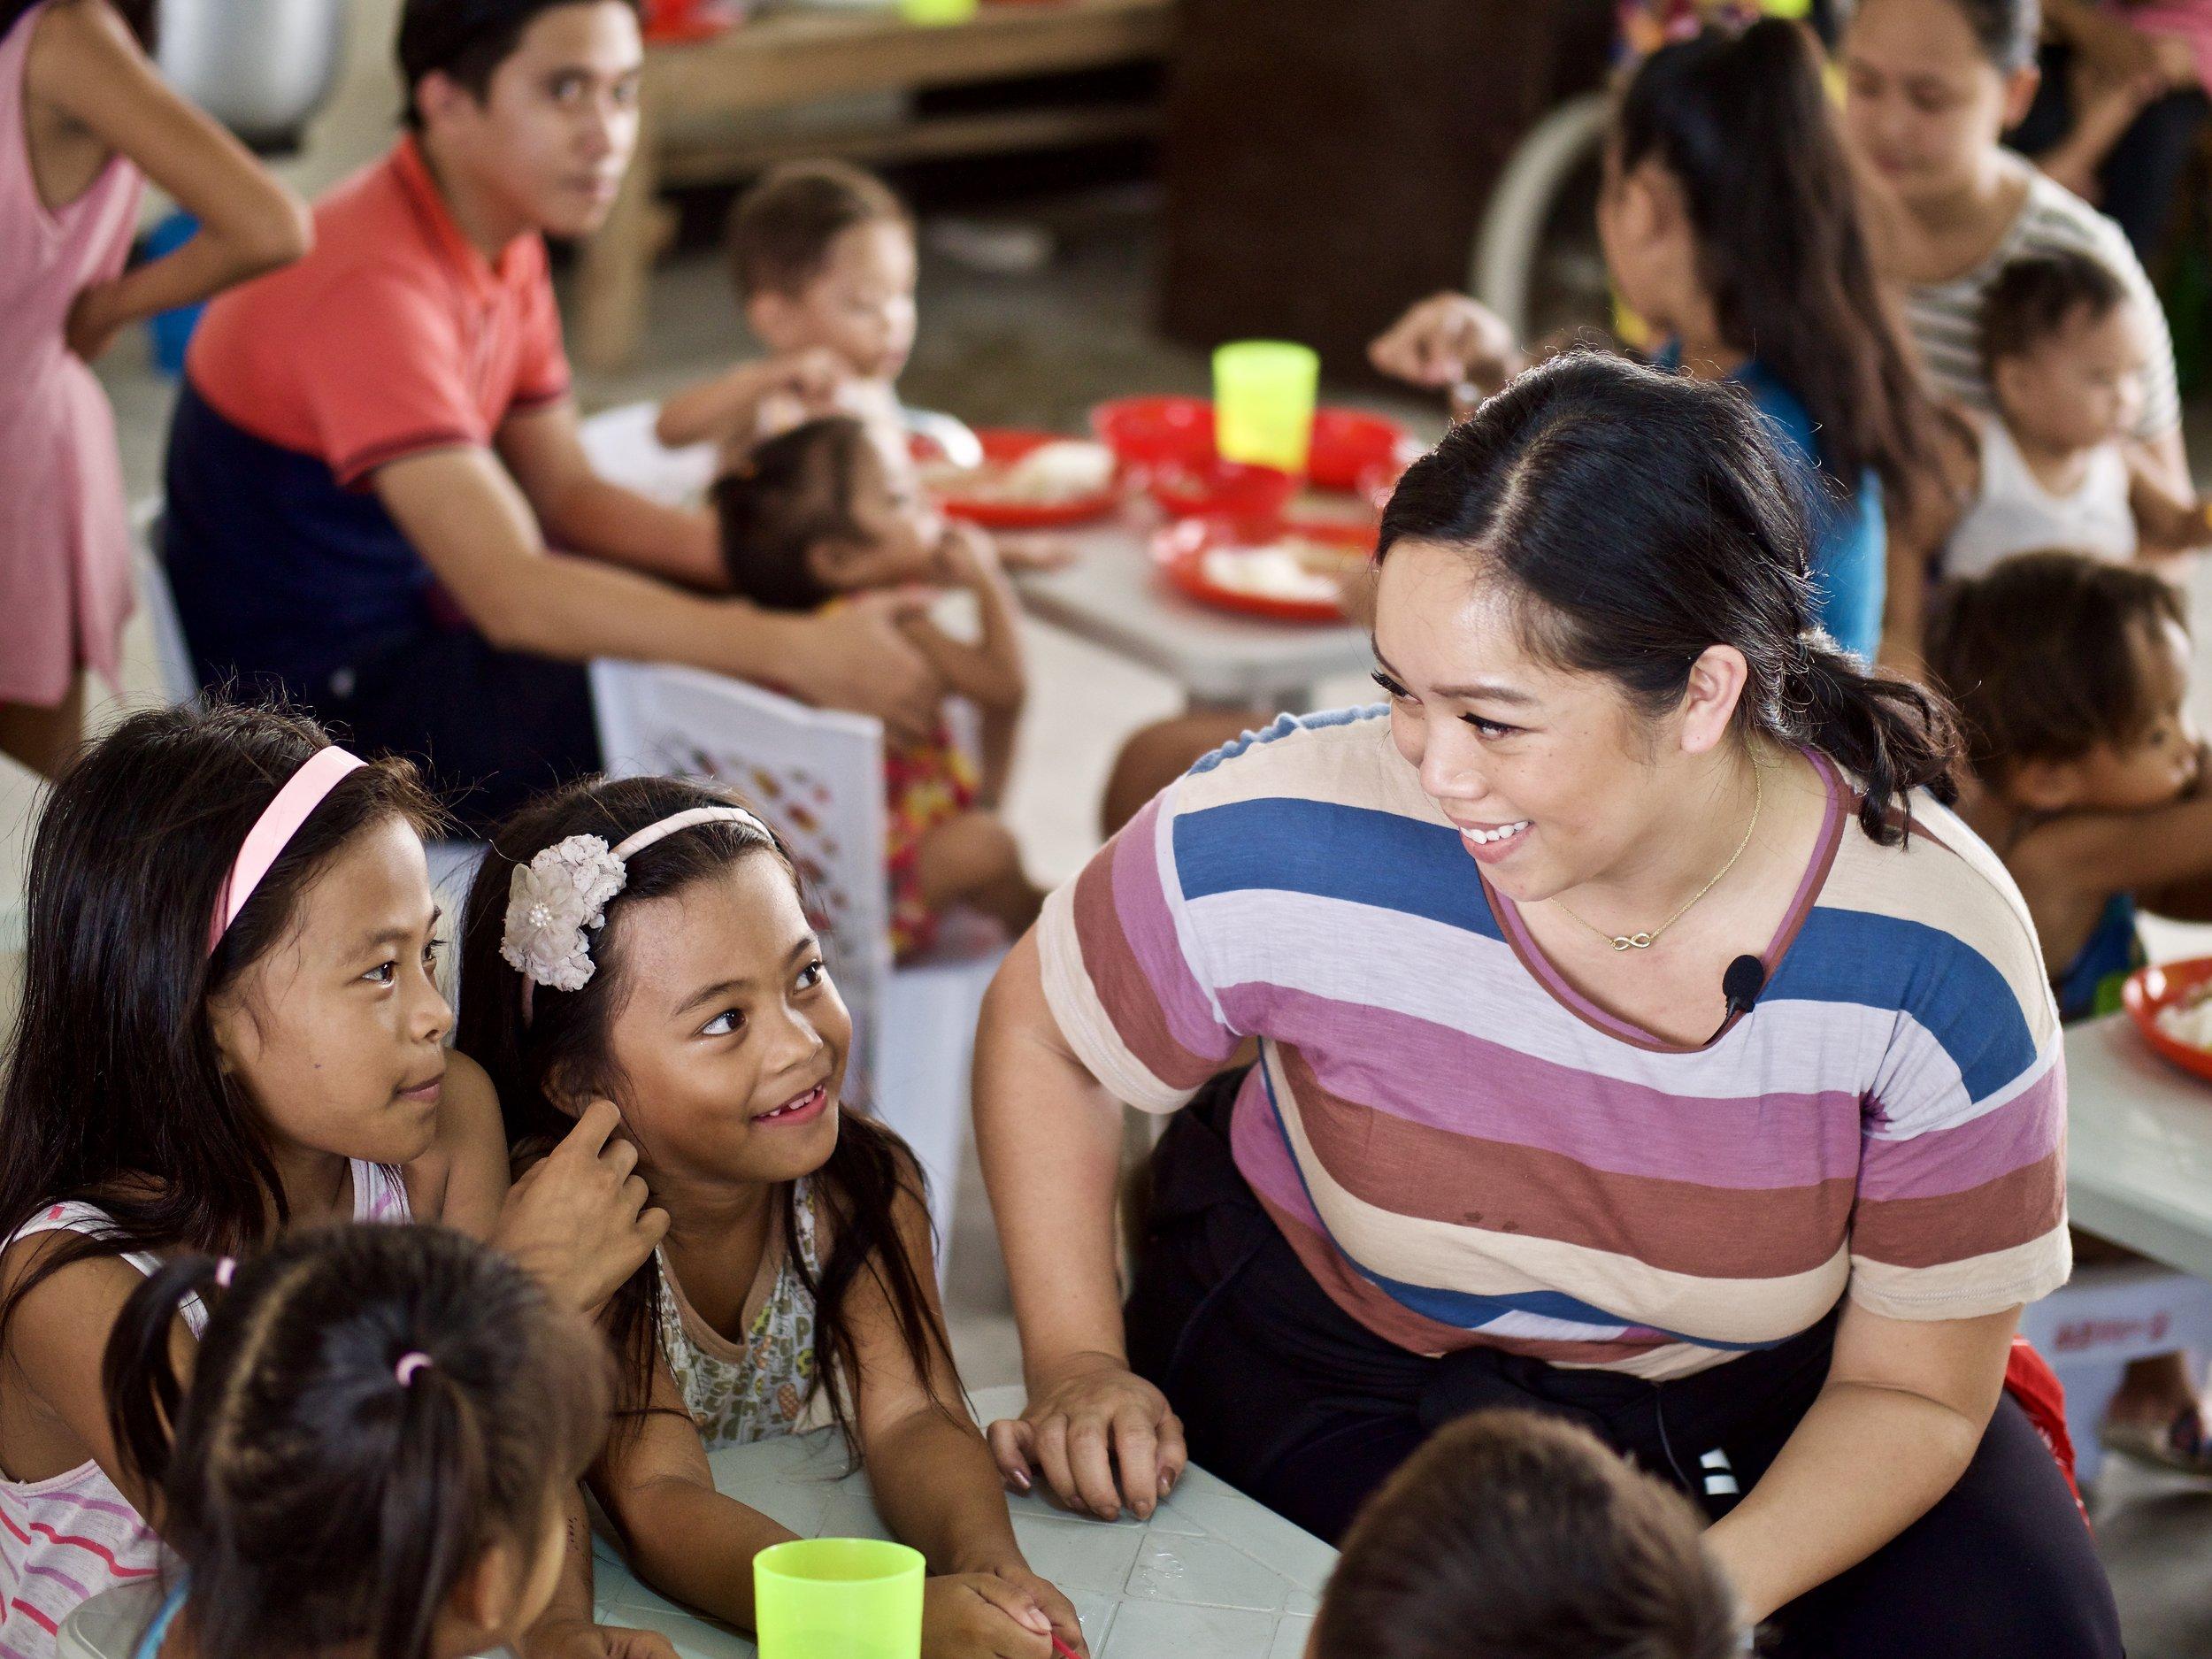 Save the Children Project NURTURE, Philippines, with Judy Travis @ItsJudysLife & @ItsJudyTime | Photo by David Löfman